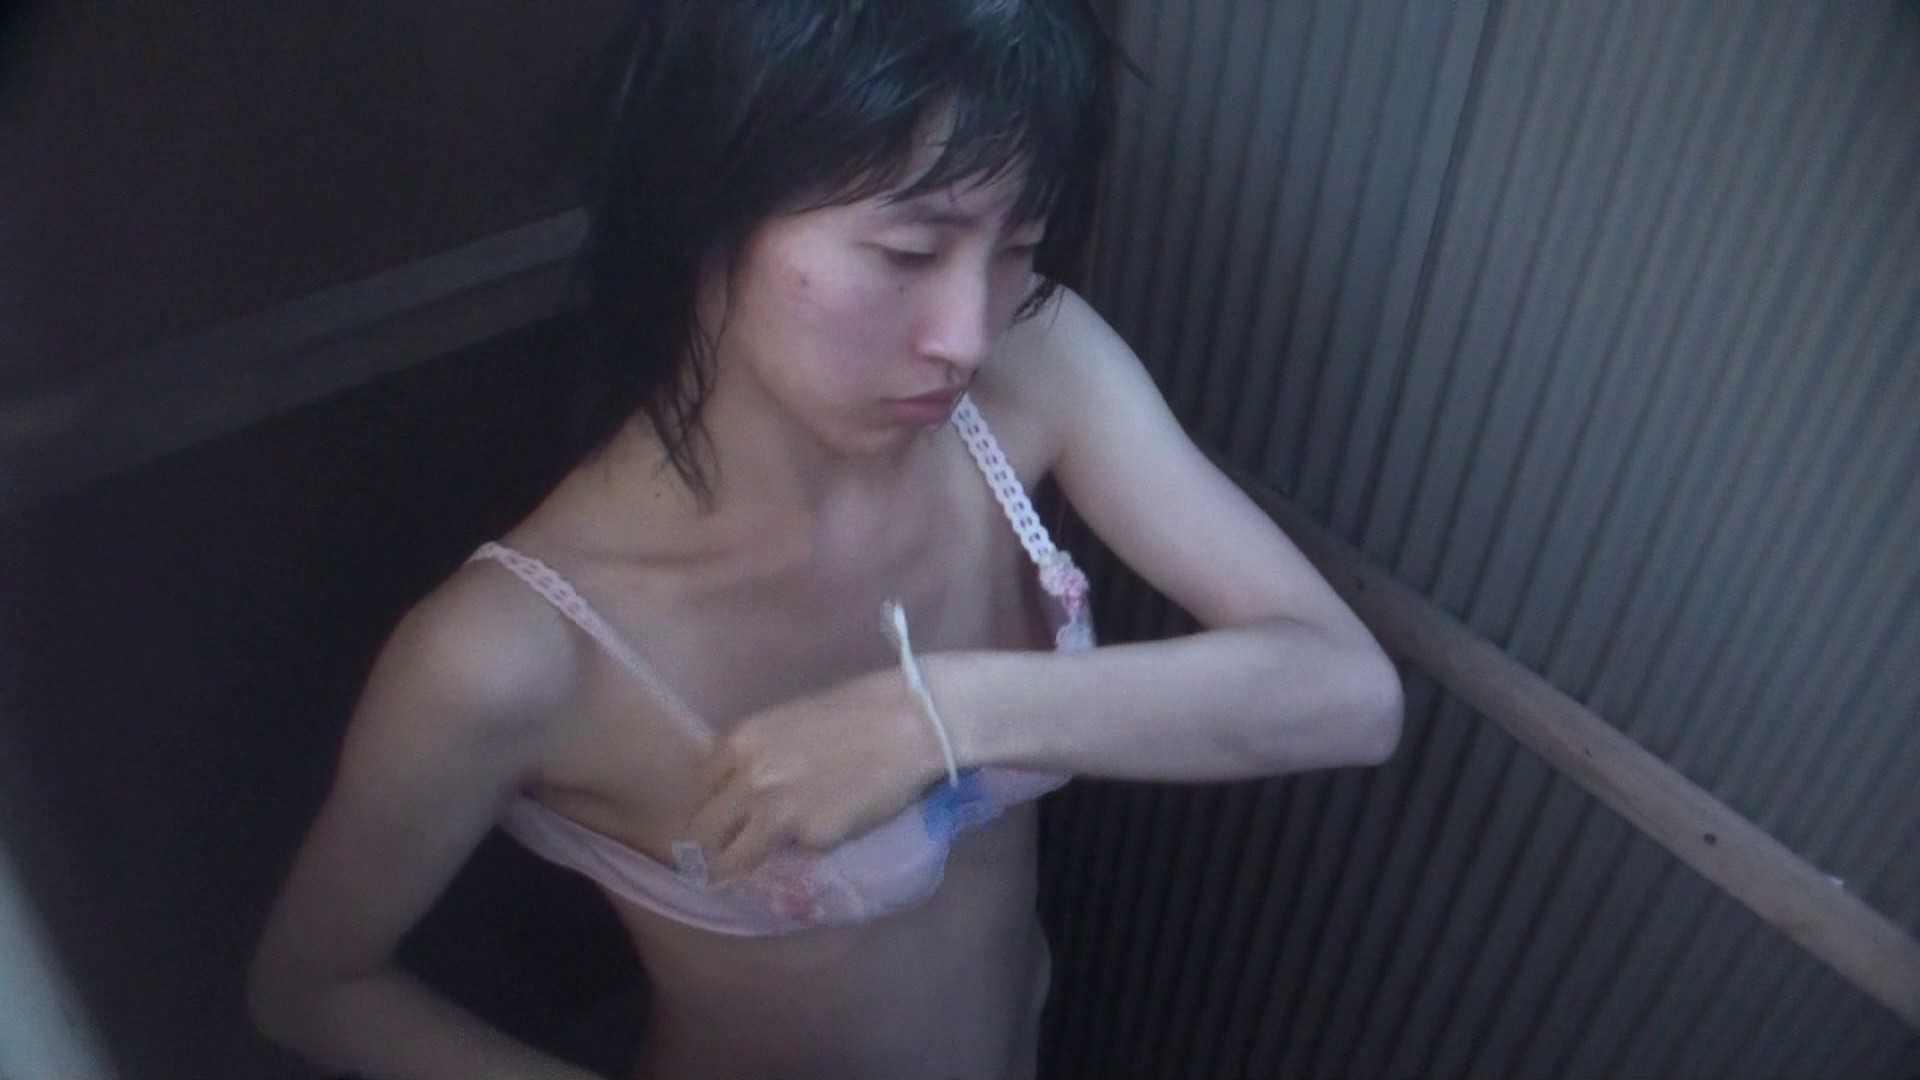 Vol.24 再登場 生理中の年齢不詳嬢 シャワーシーン おめこ無修正画像 24連発 17